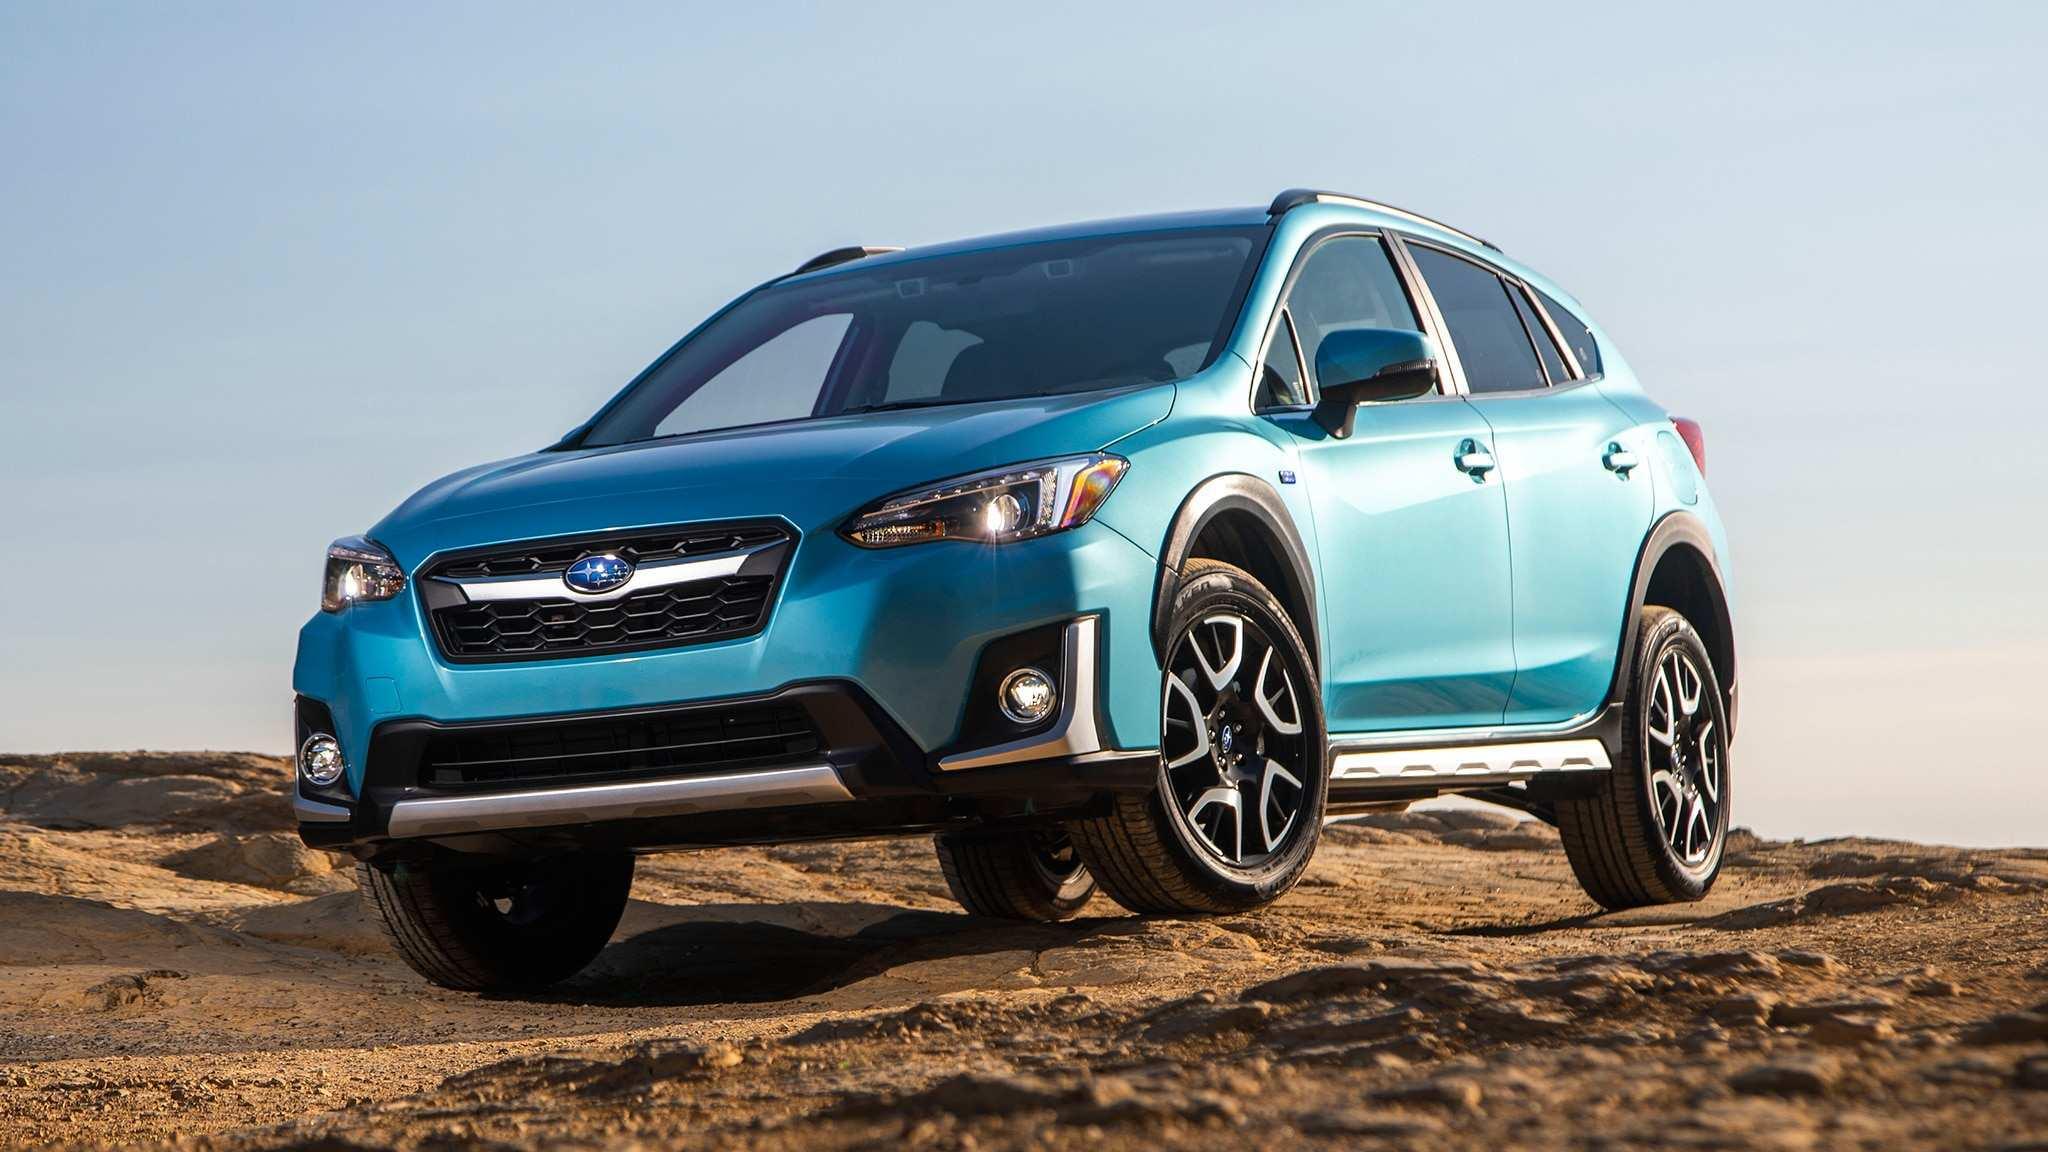 76 The Subaru Crosstrek 2020 Performance and New Engine for Subaru Crosstrek 2020